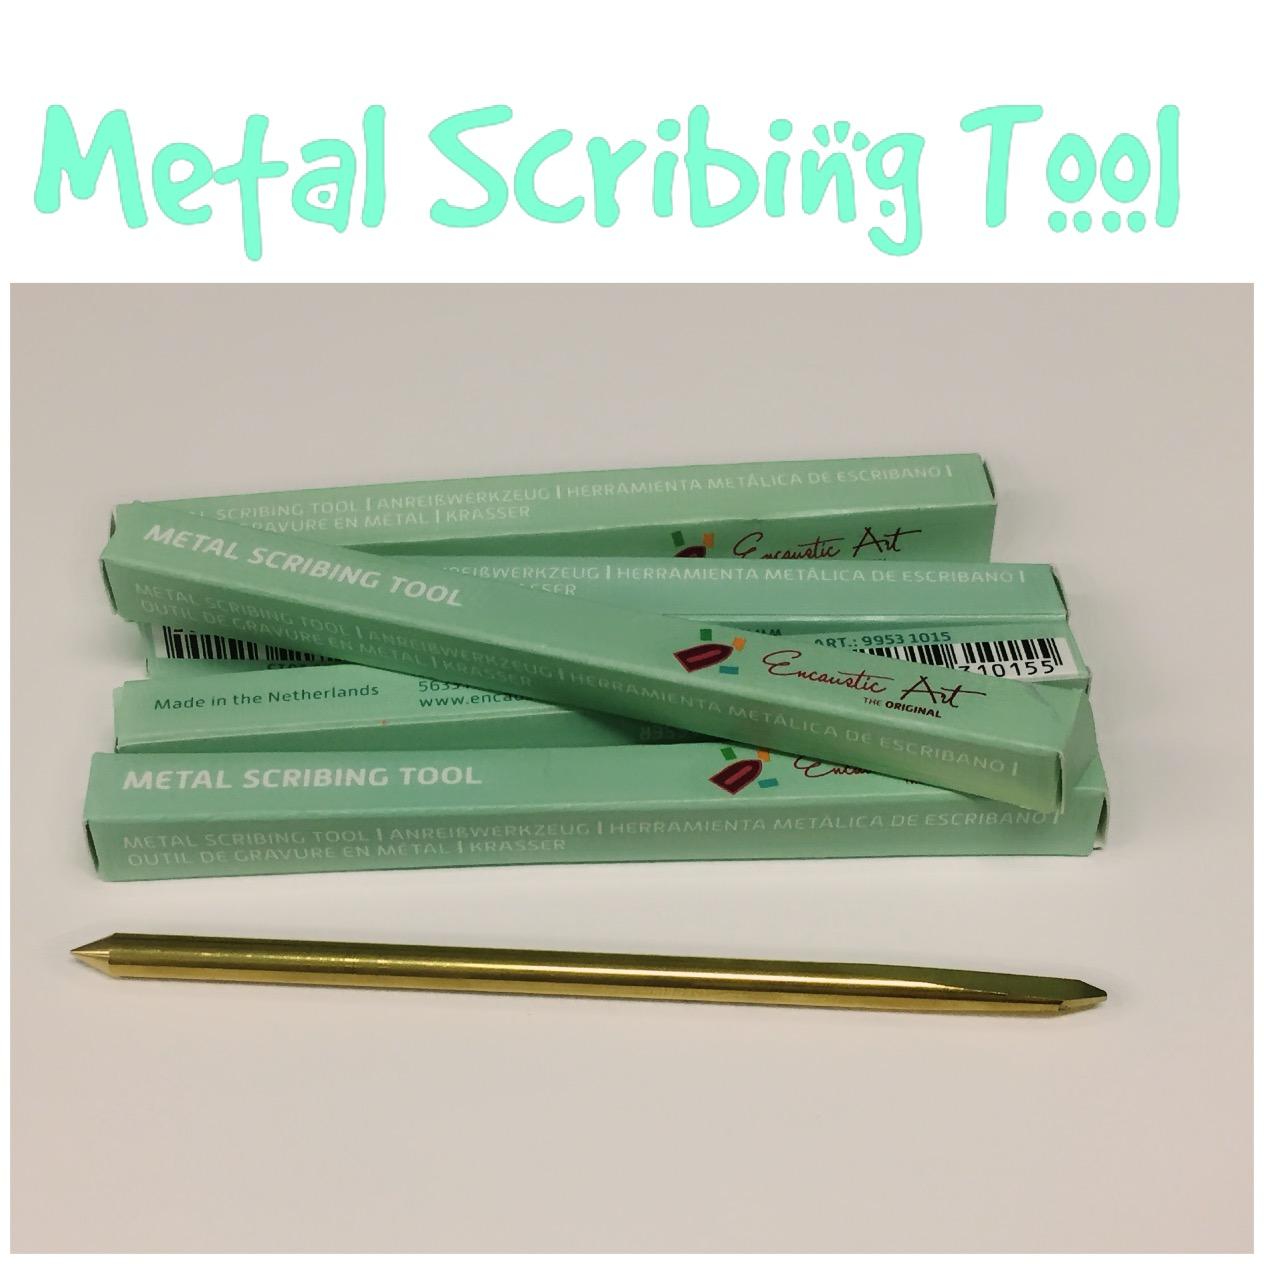 Metal Scribe Tool